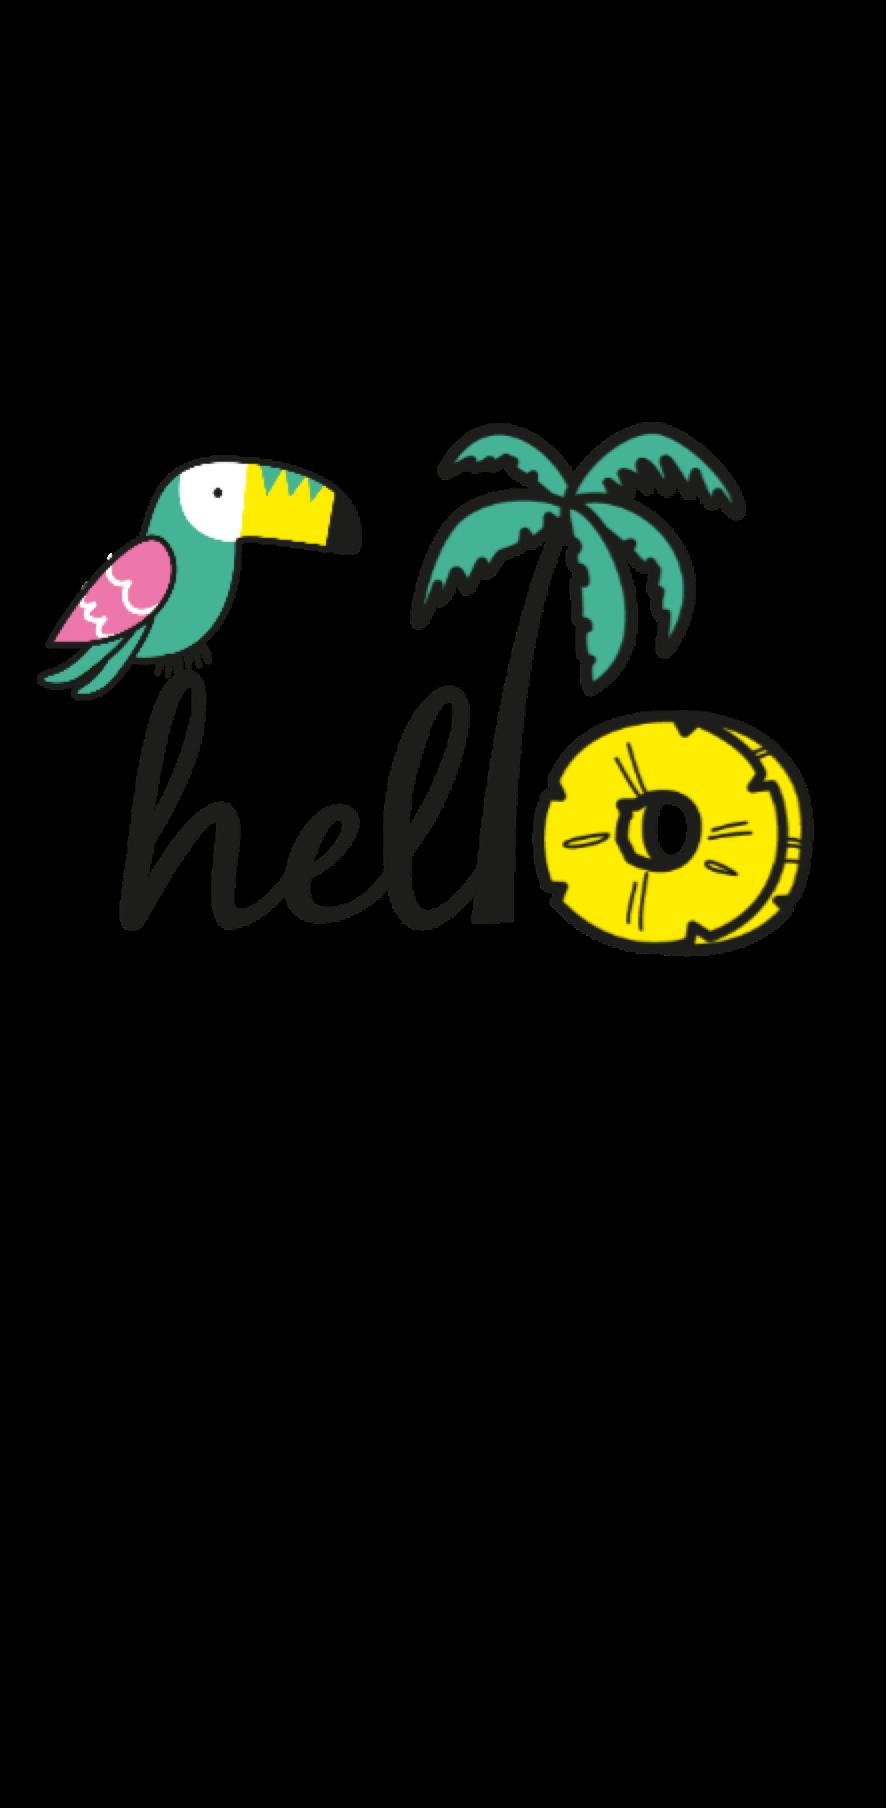 cover hello summer